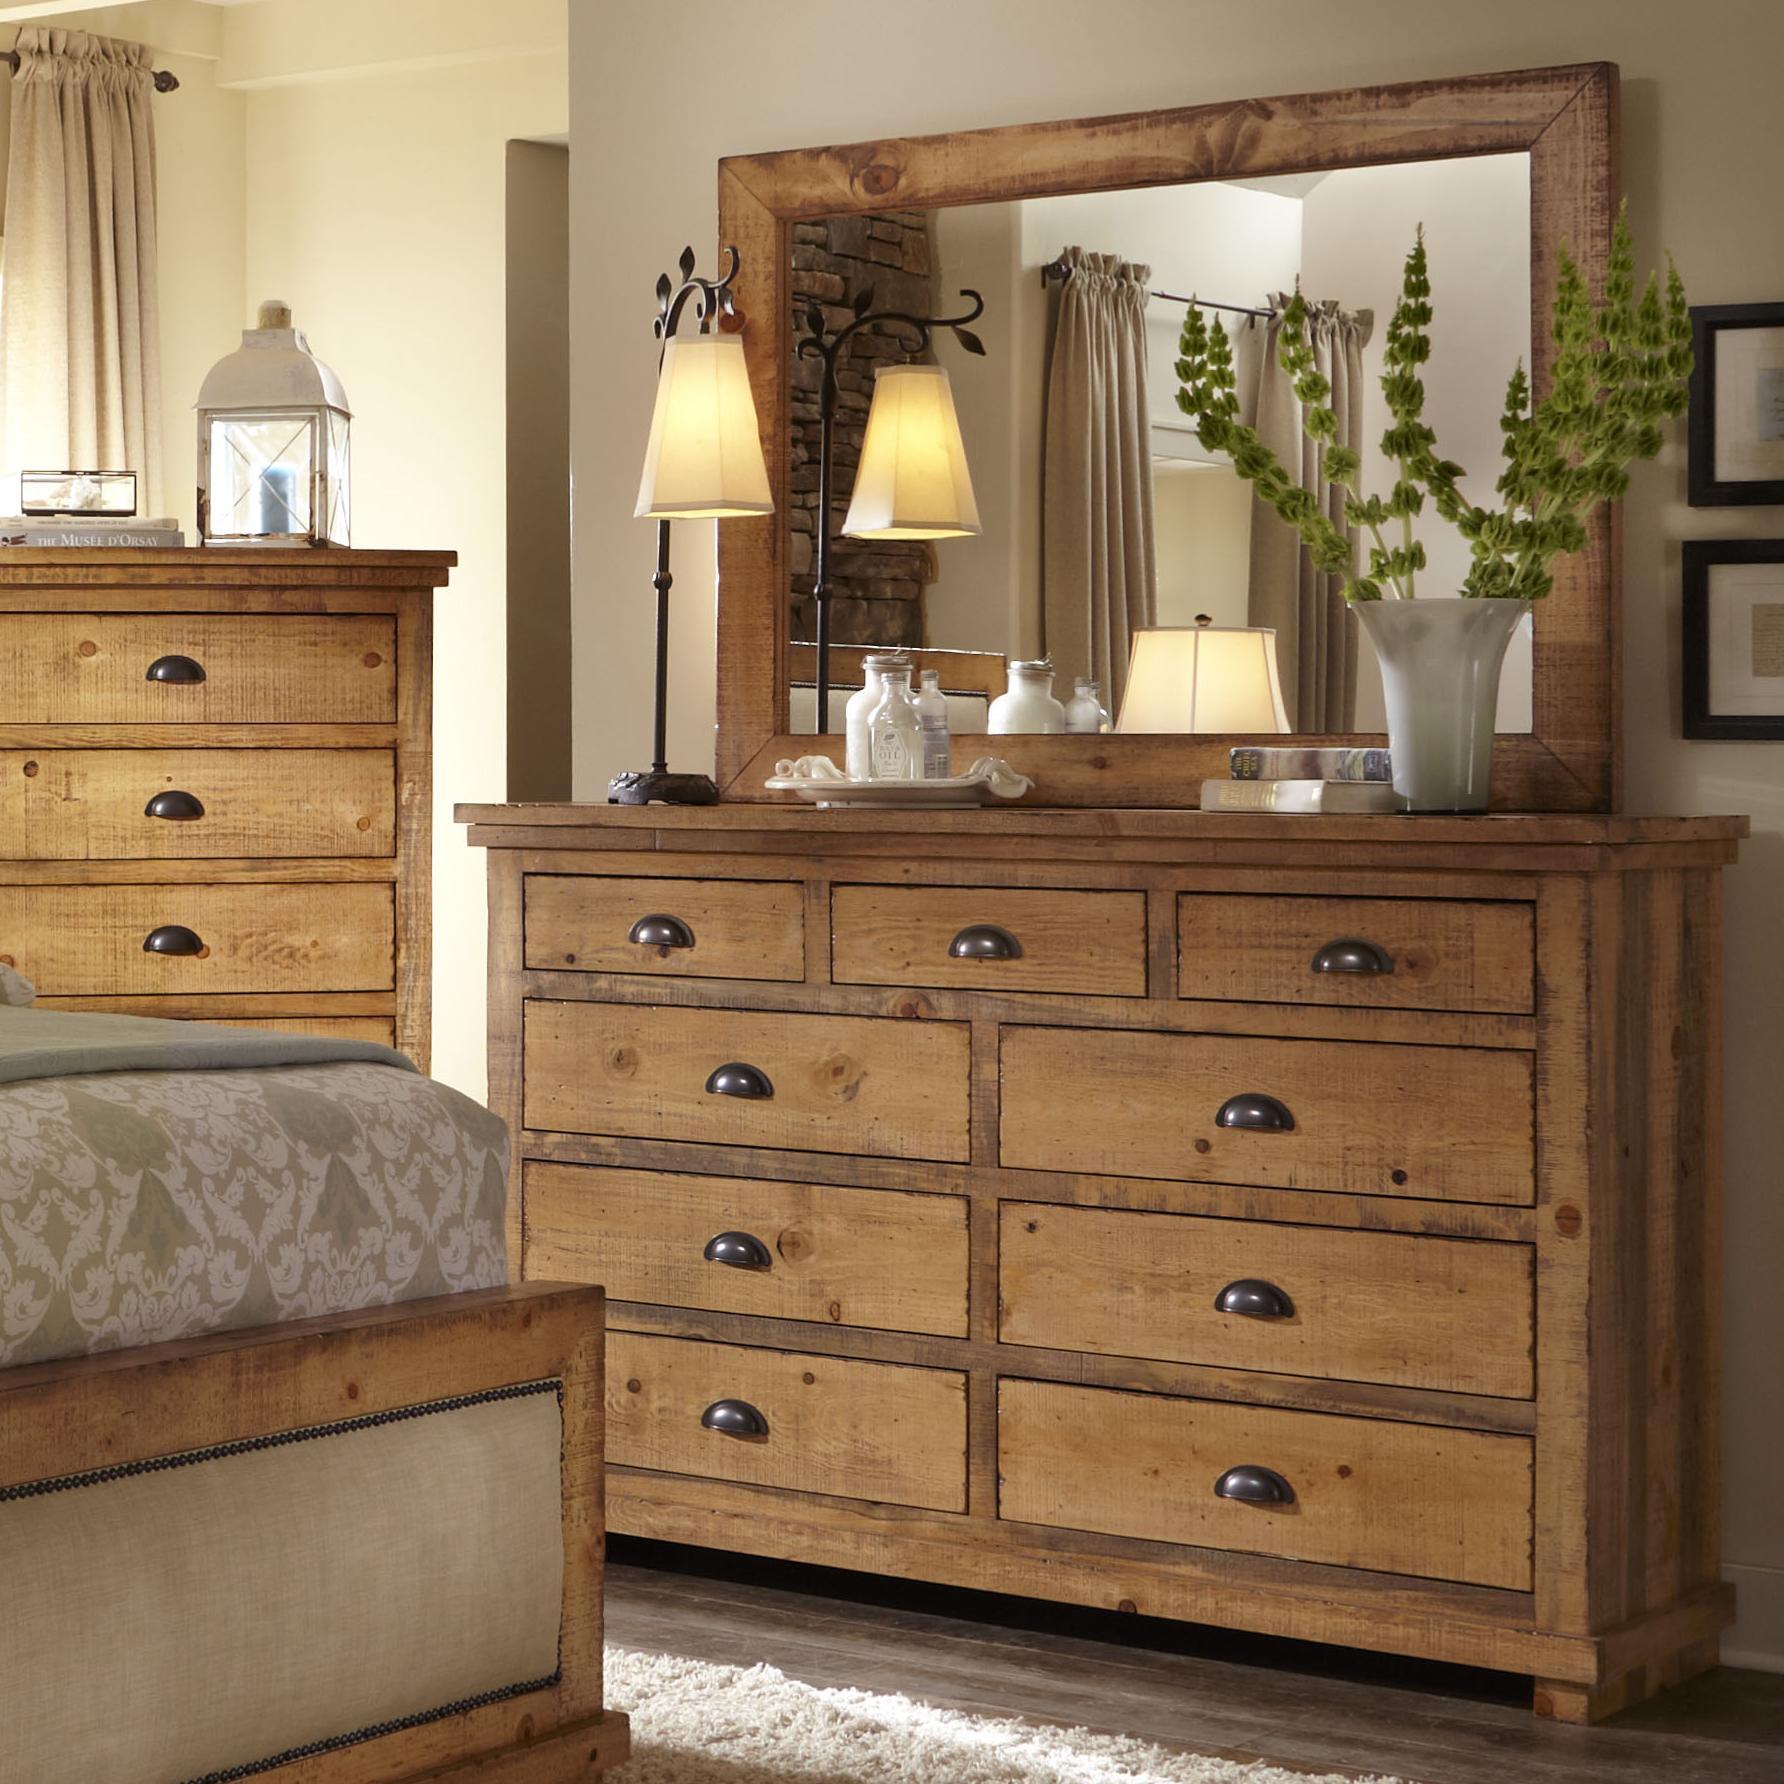 Progressive Furniture Willow Drawer Dresser Mirror Item Number P608 23 50